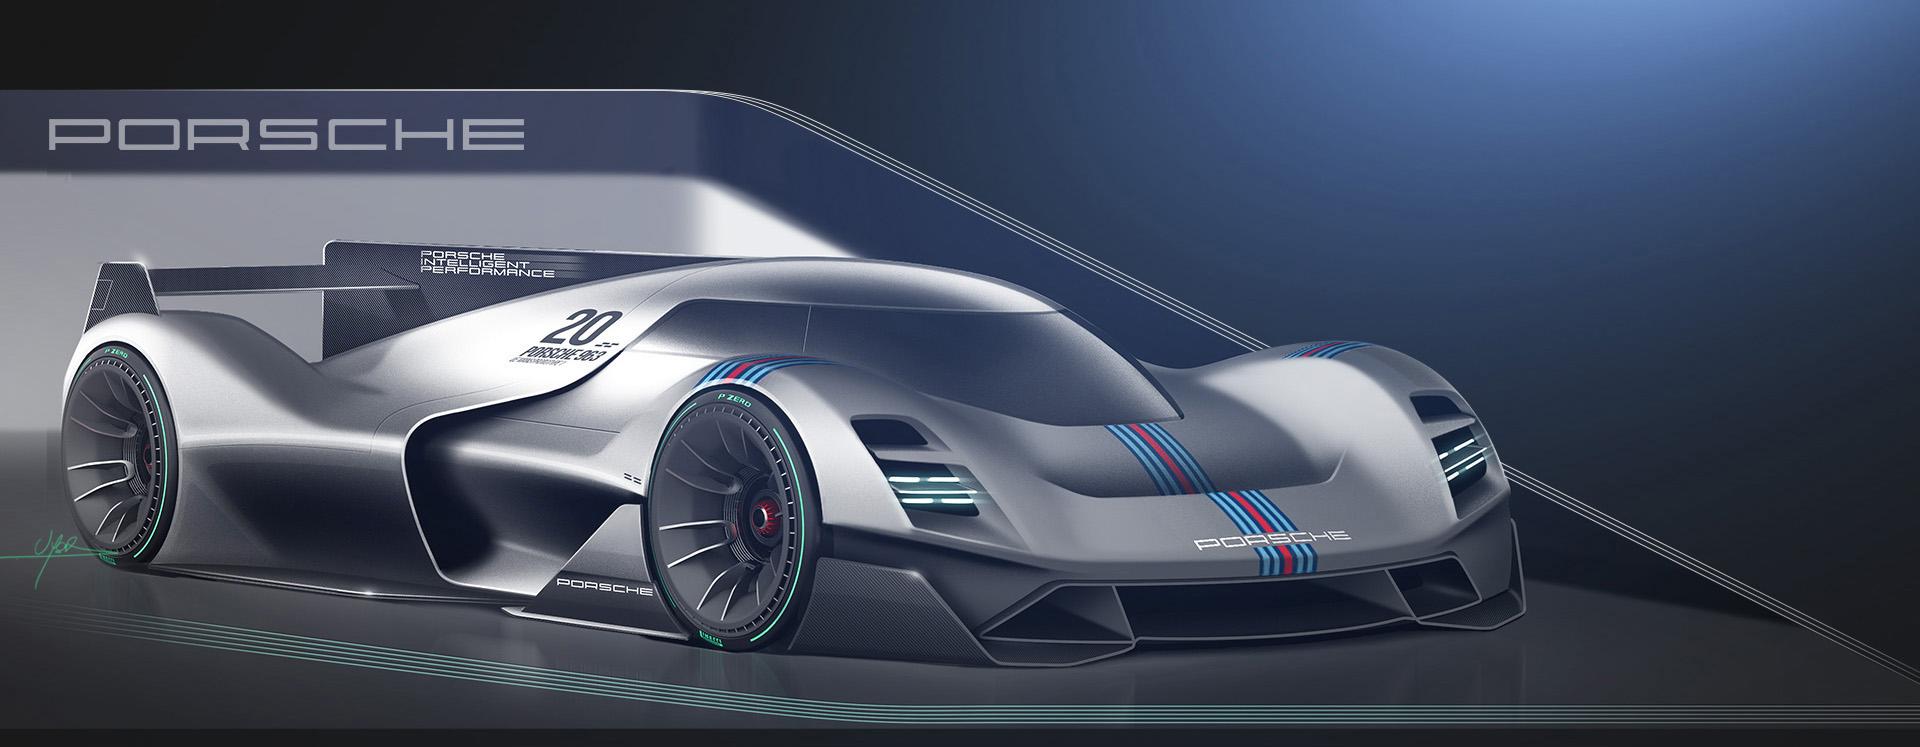 Porsche Vision GT WIP on Behance on vision mazda gt, vision ford gt, vision toyota gt, vision nissan gt,